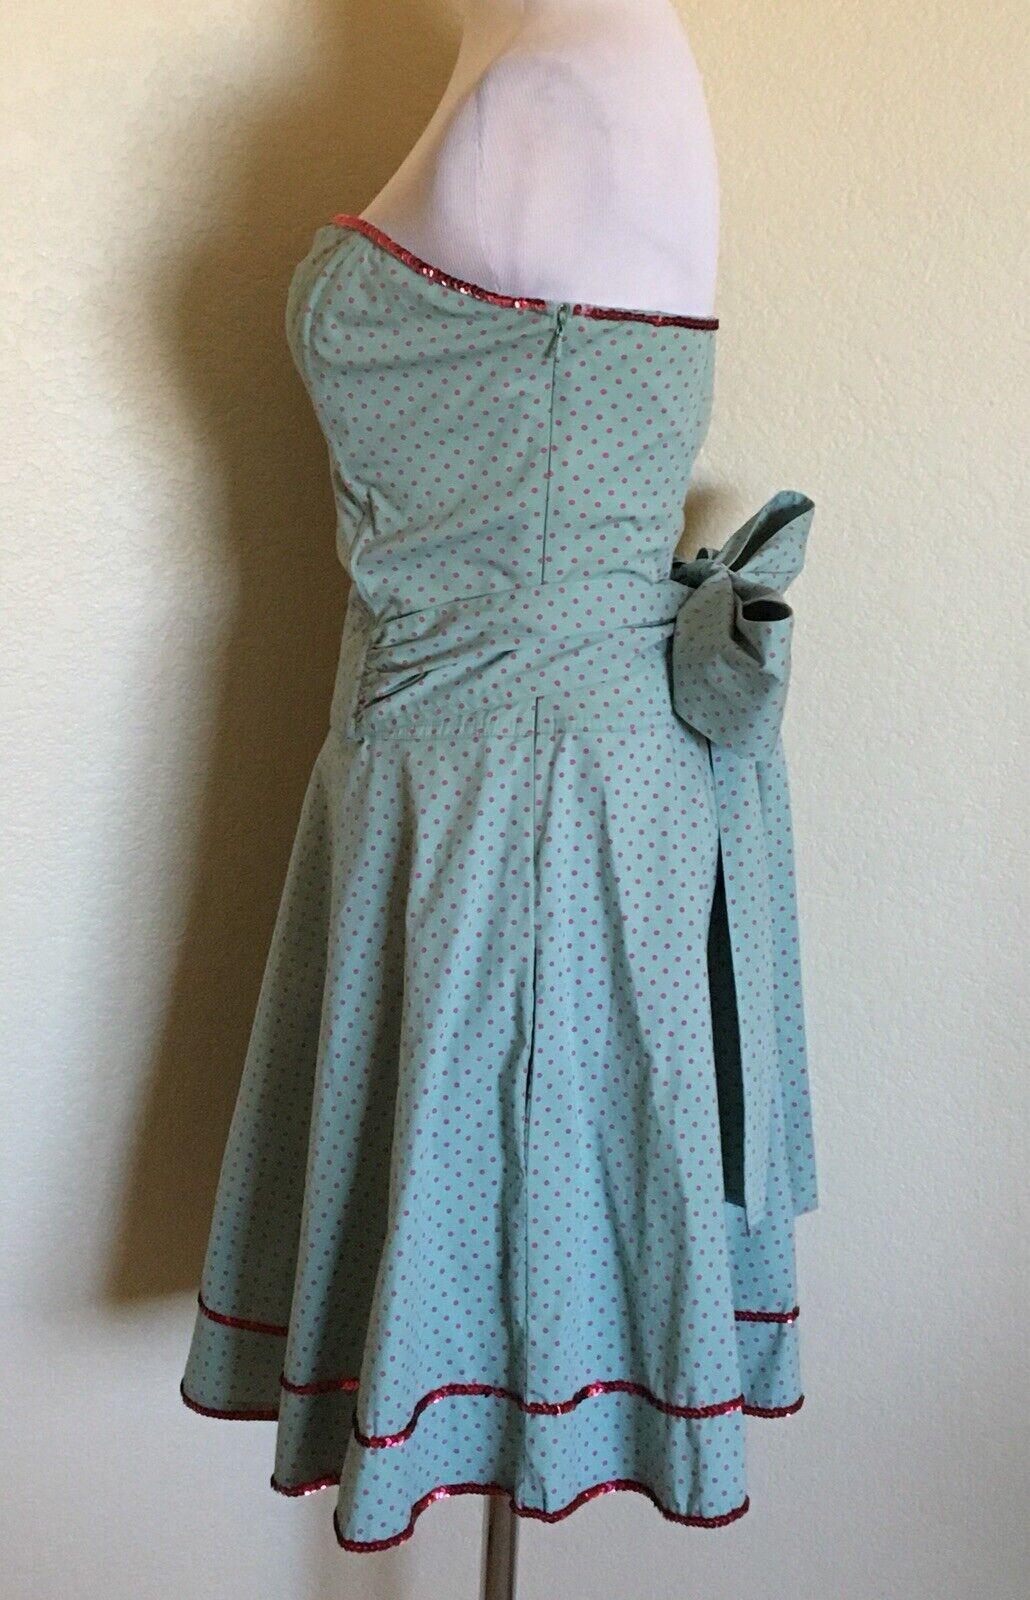 BETSEY JOHNSON NEW YORK Dress Size 6  bluee & Pink Polka dot Fit & Flare